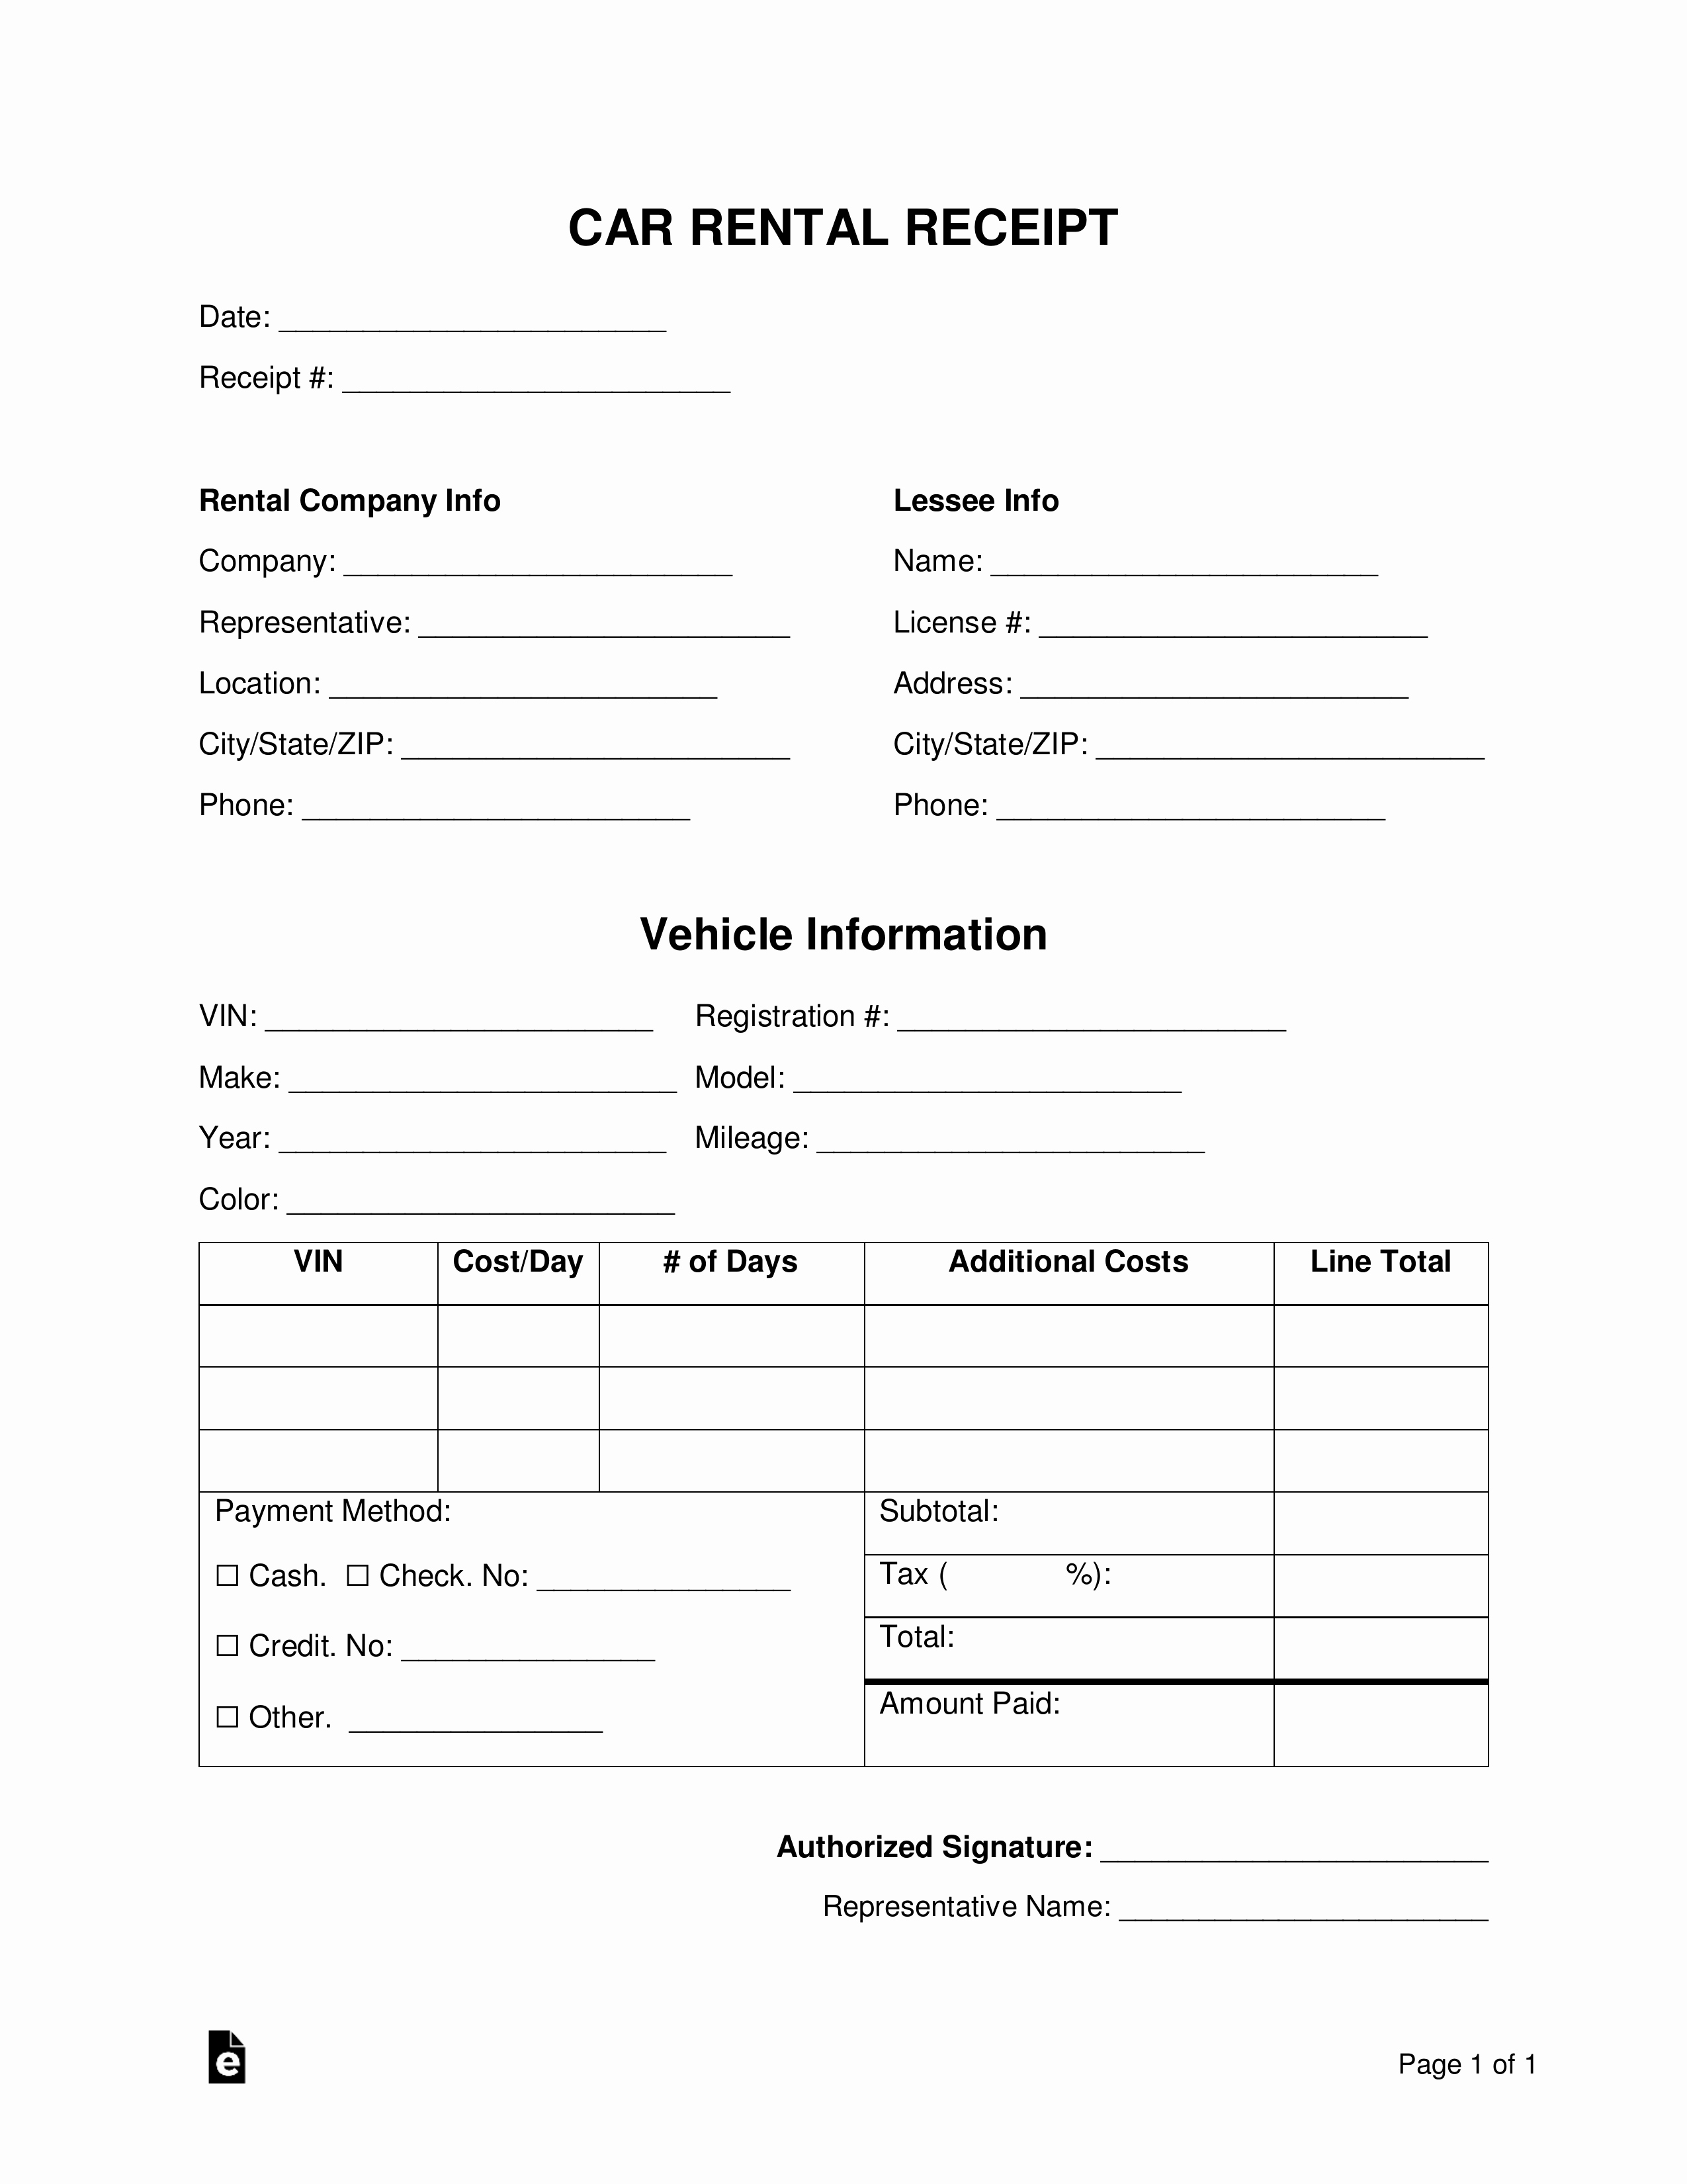 Rental Receipt Template Pdf Fresh Free Car Rental Receipt Template Word Pdf